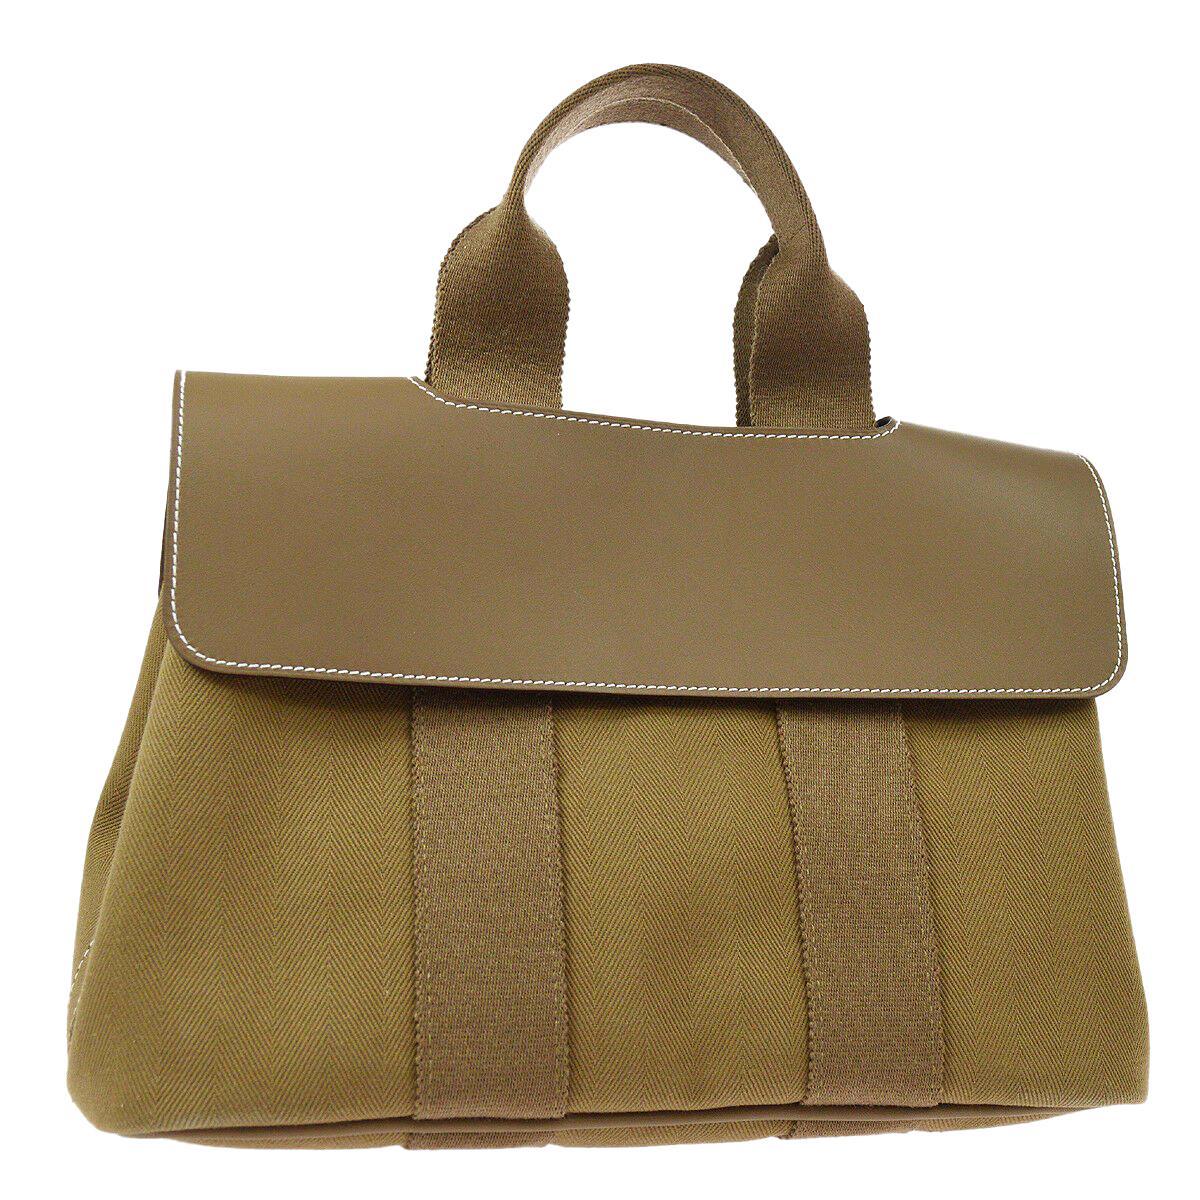 00047f458fd Vintage Hermès Handbags and Purses - 2